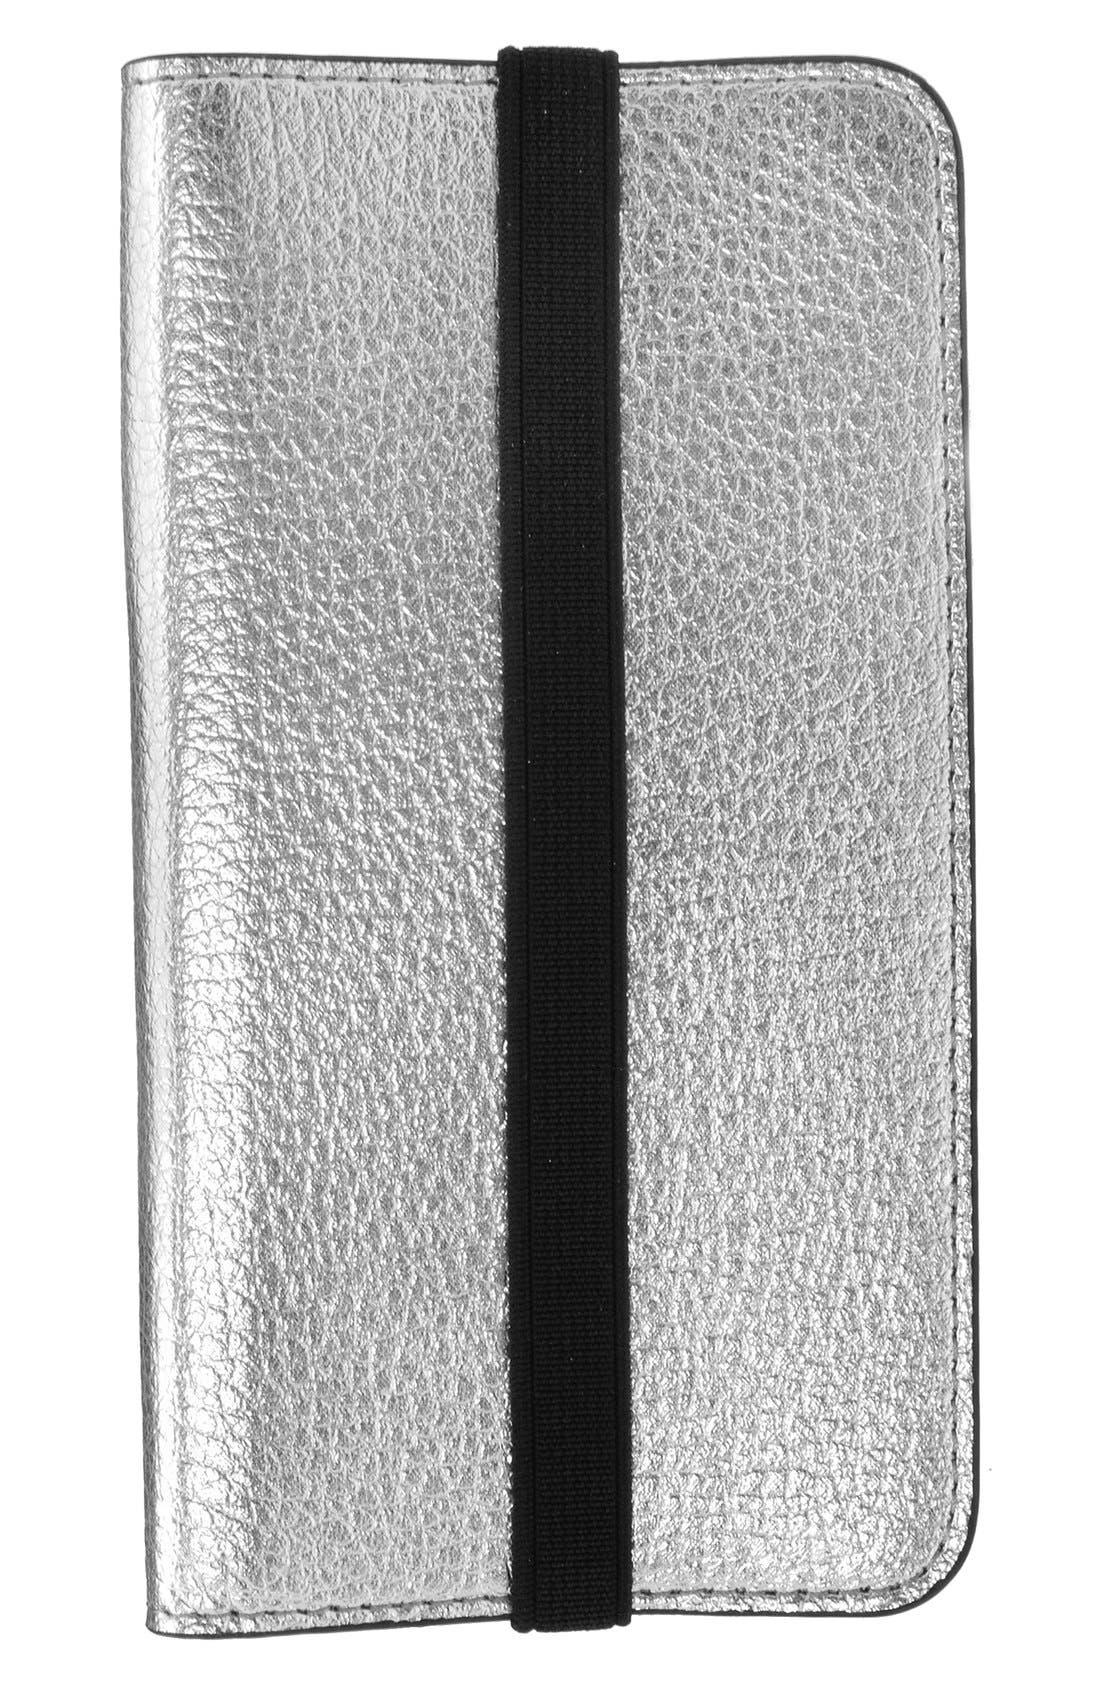 iPhone 6/6s Metallic Leather Wallet Case,                         Main,                         color, Metallic Silver/ Fuchsia